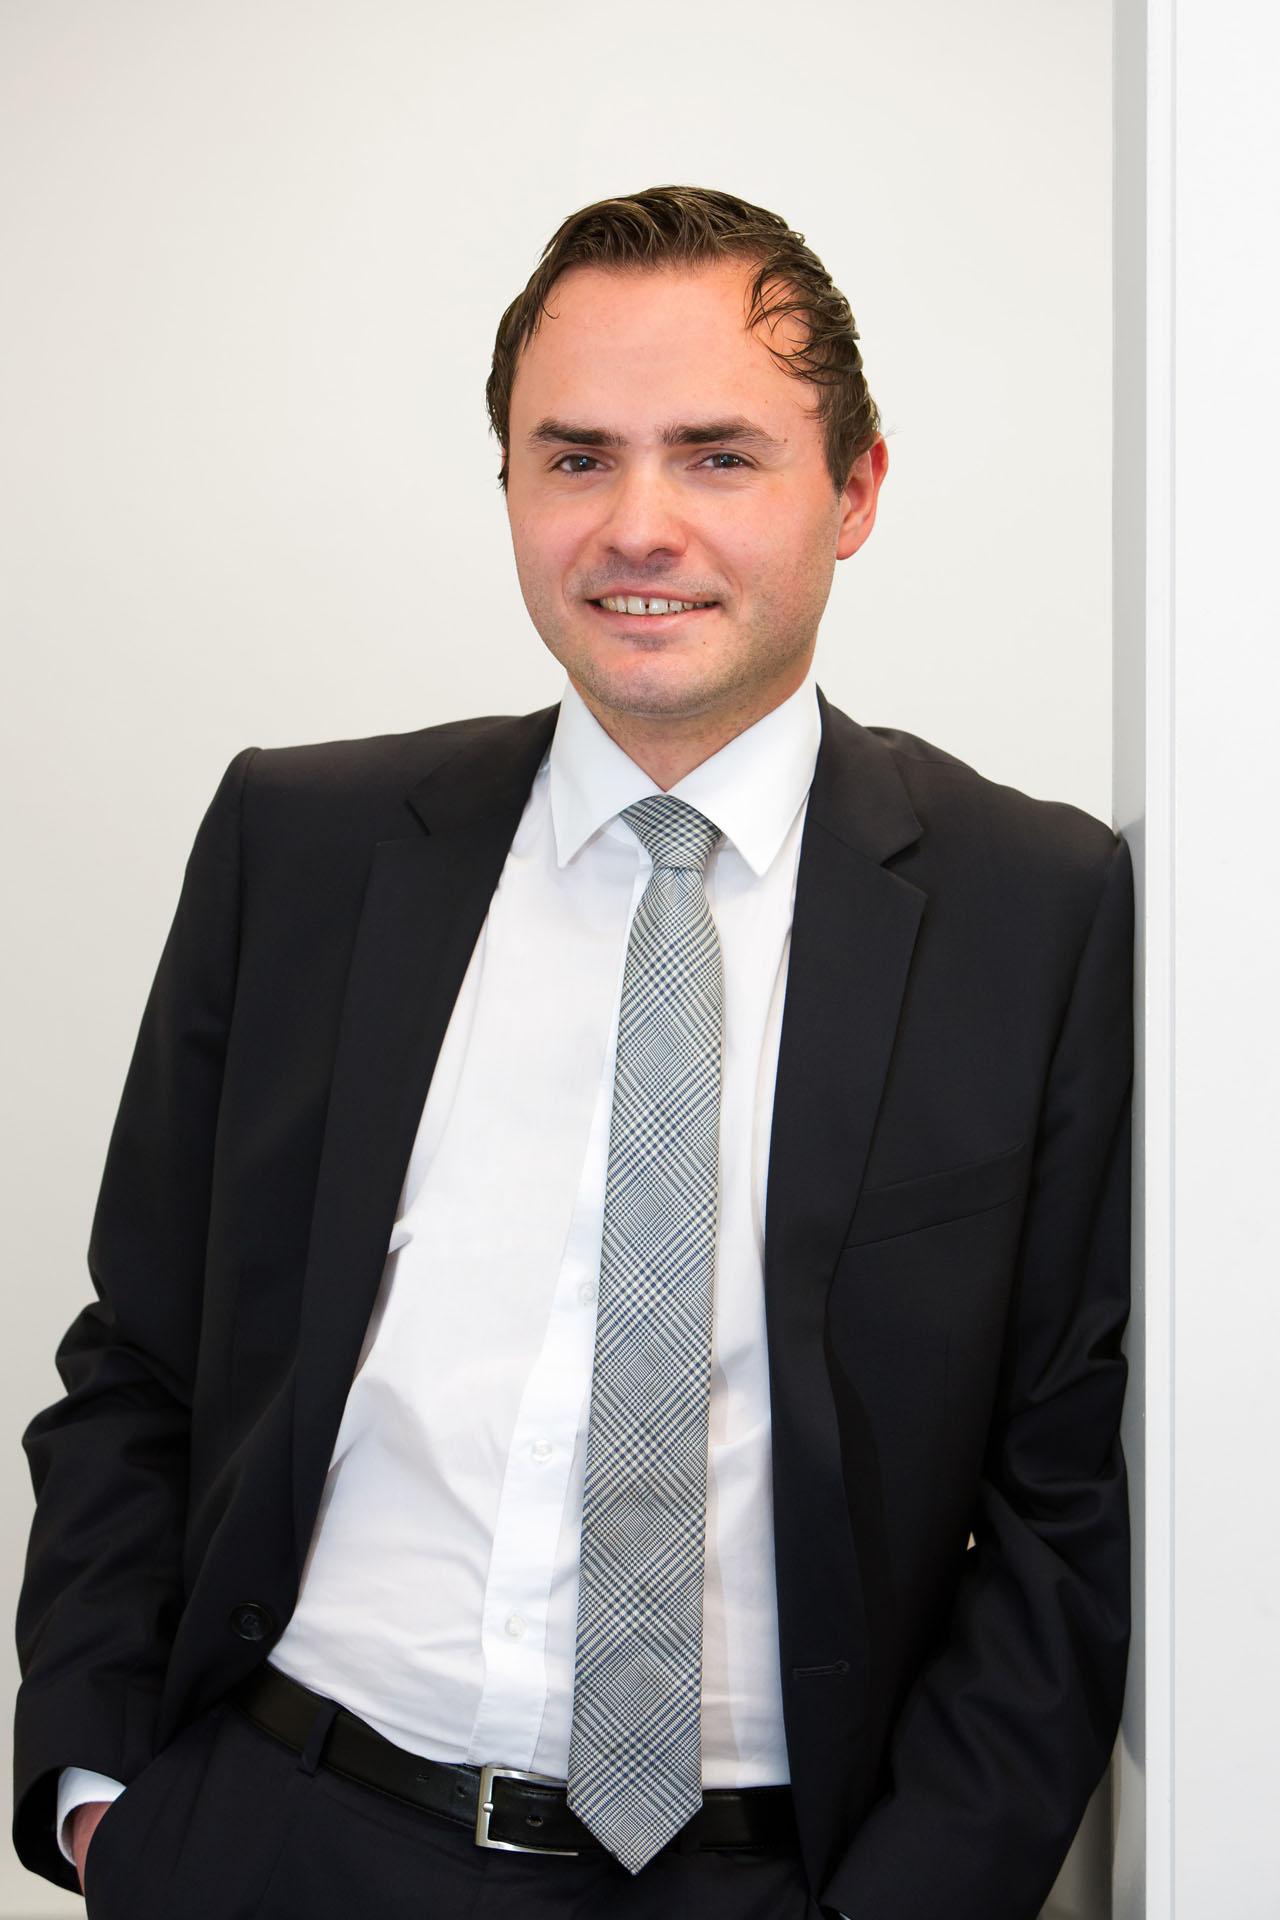 Portraitserie   Rechtsanwalt Stefan Radmacher   Mai 2013